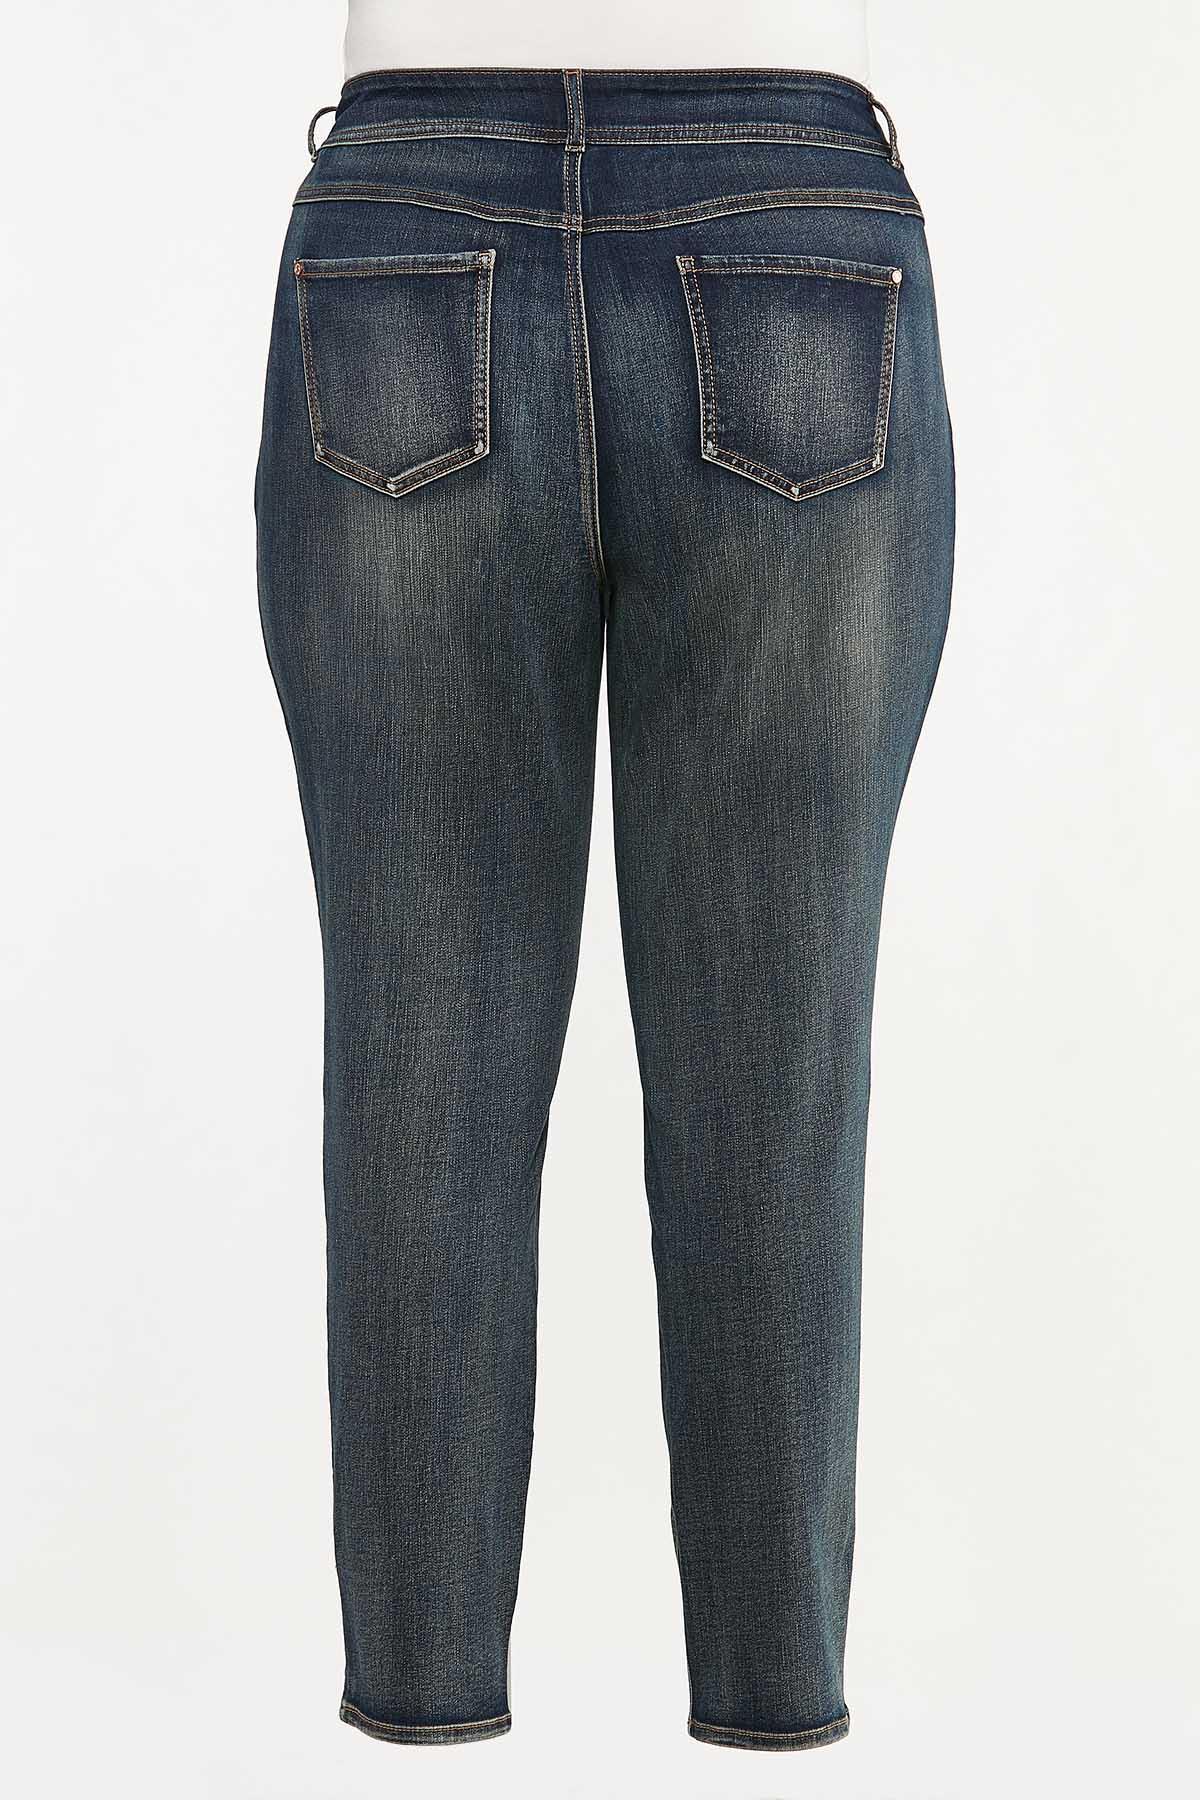 Plus Size Skinny Shape Enhancing Jeans (Item #44664542)